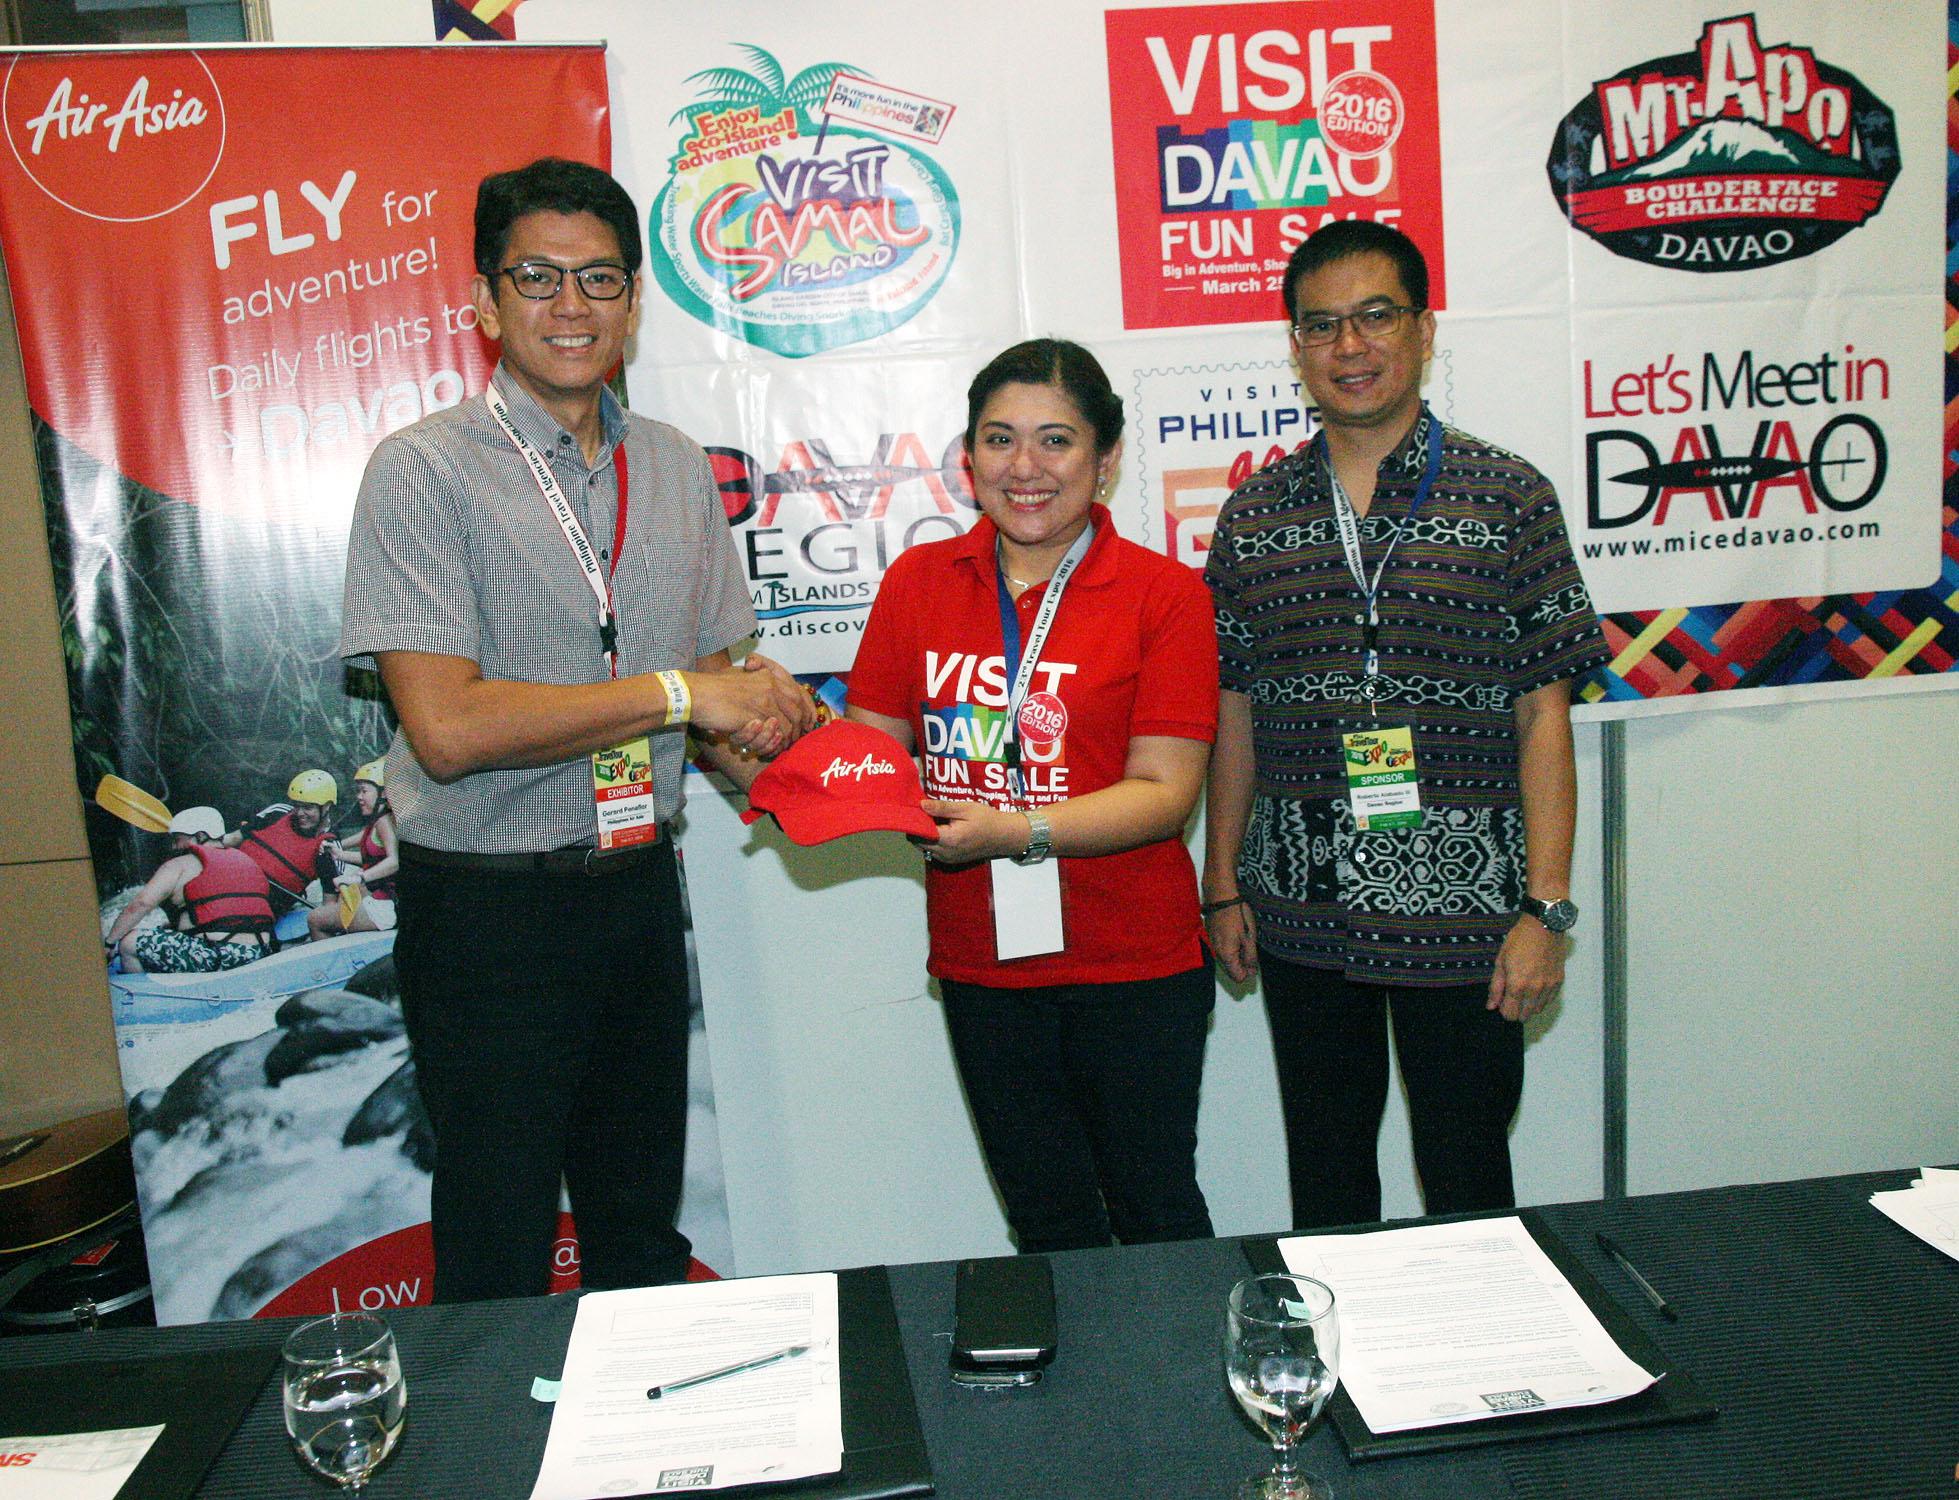 AirAsia, Davao tourism partner for Visit Davao Fun Sale 2016